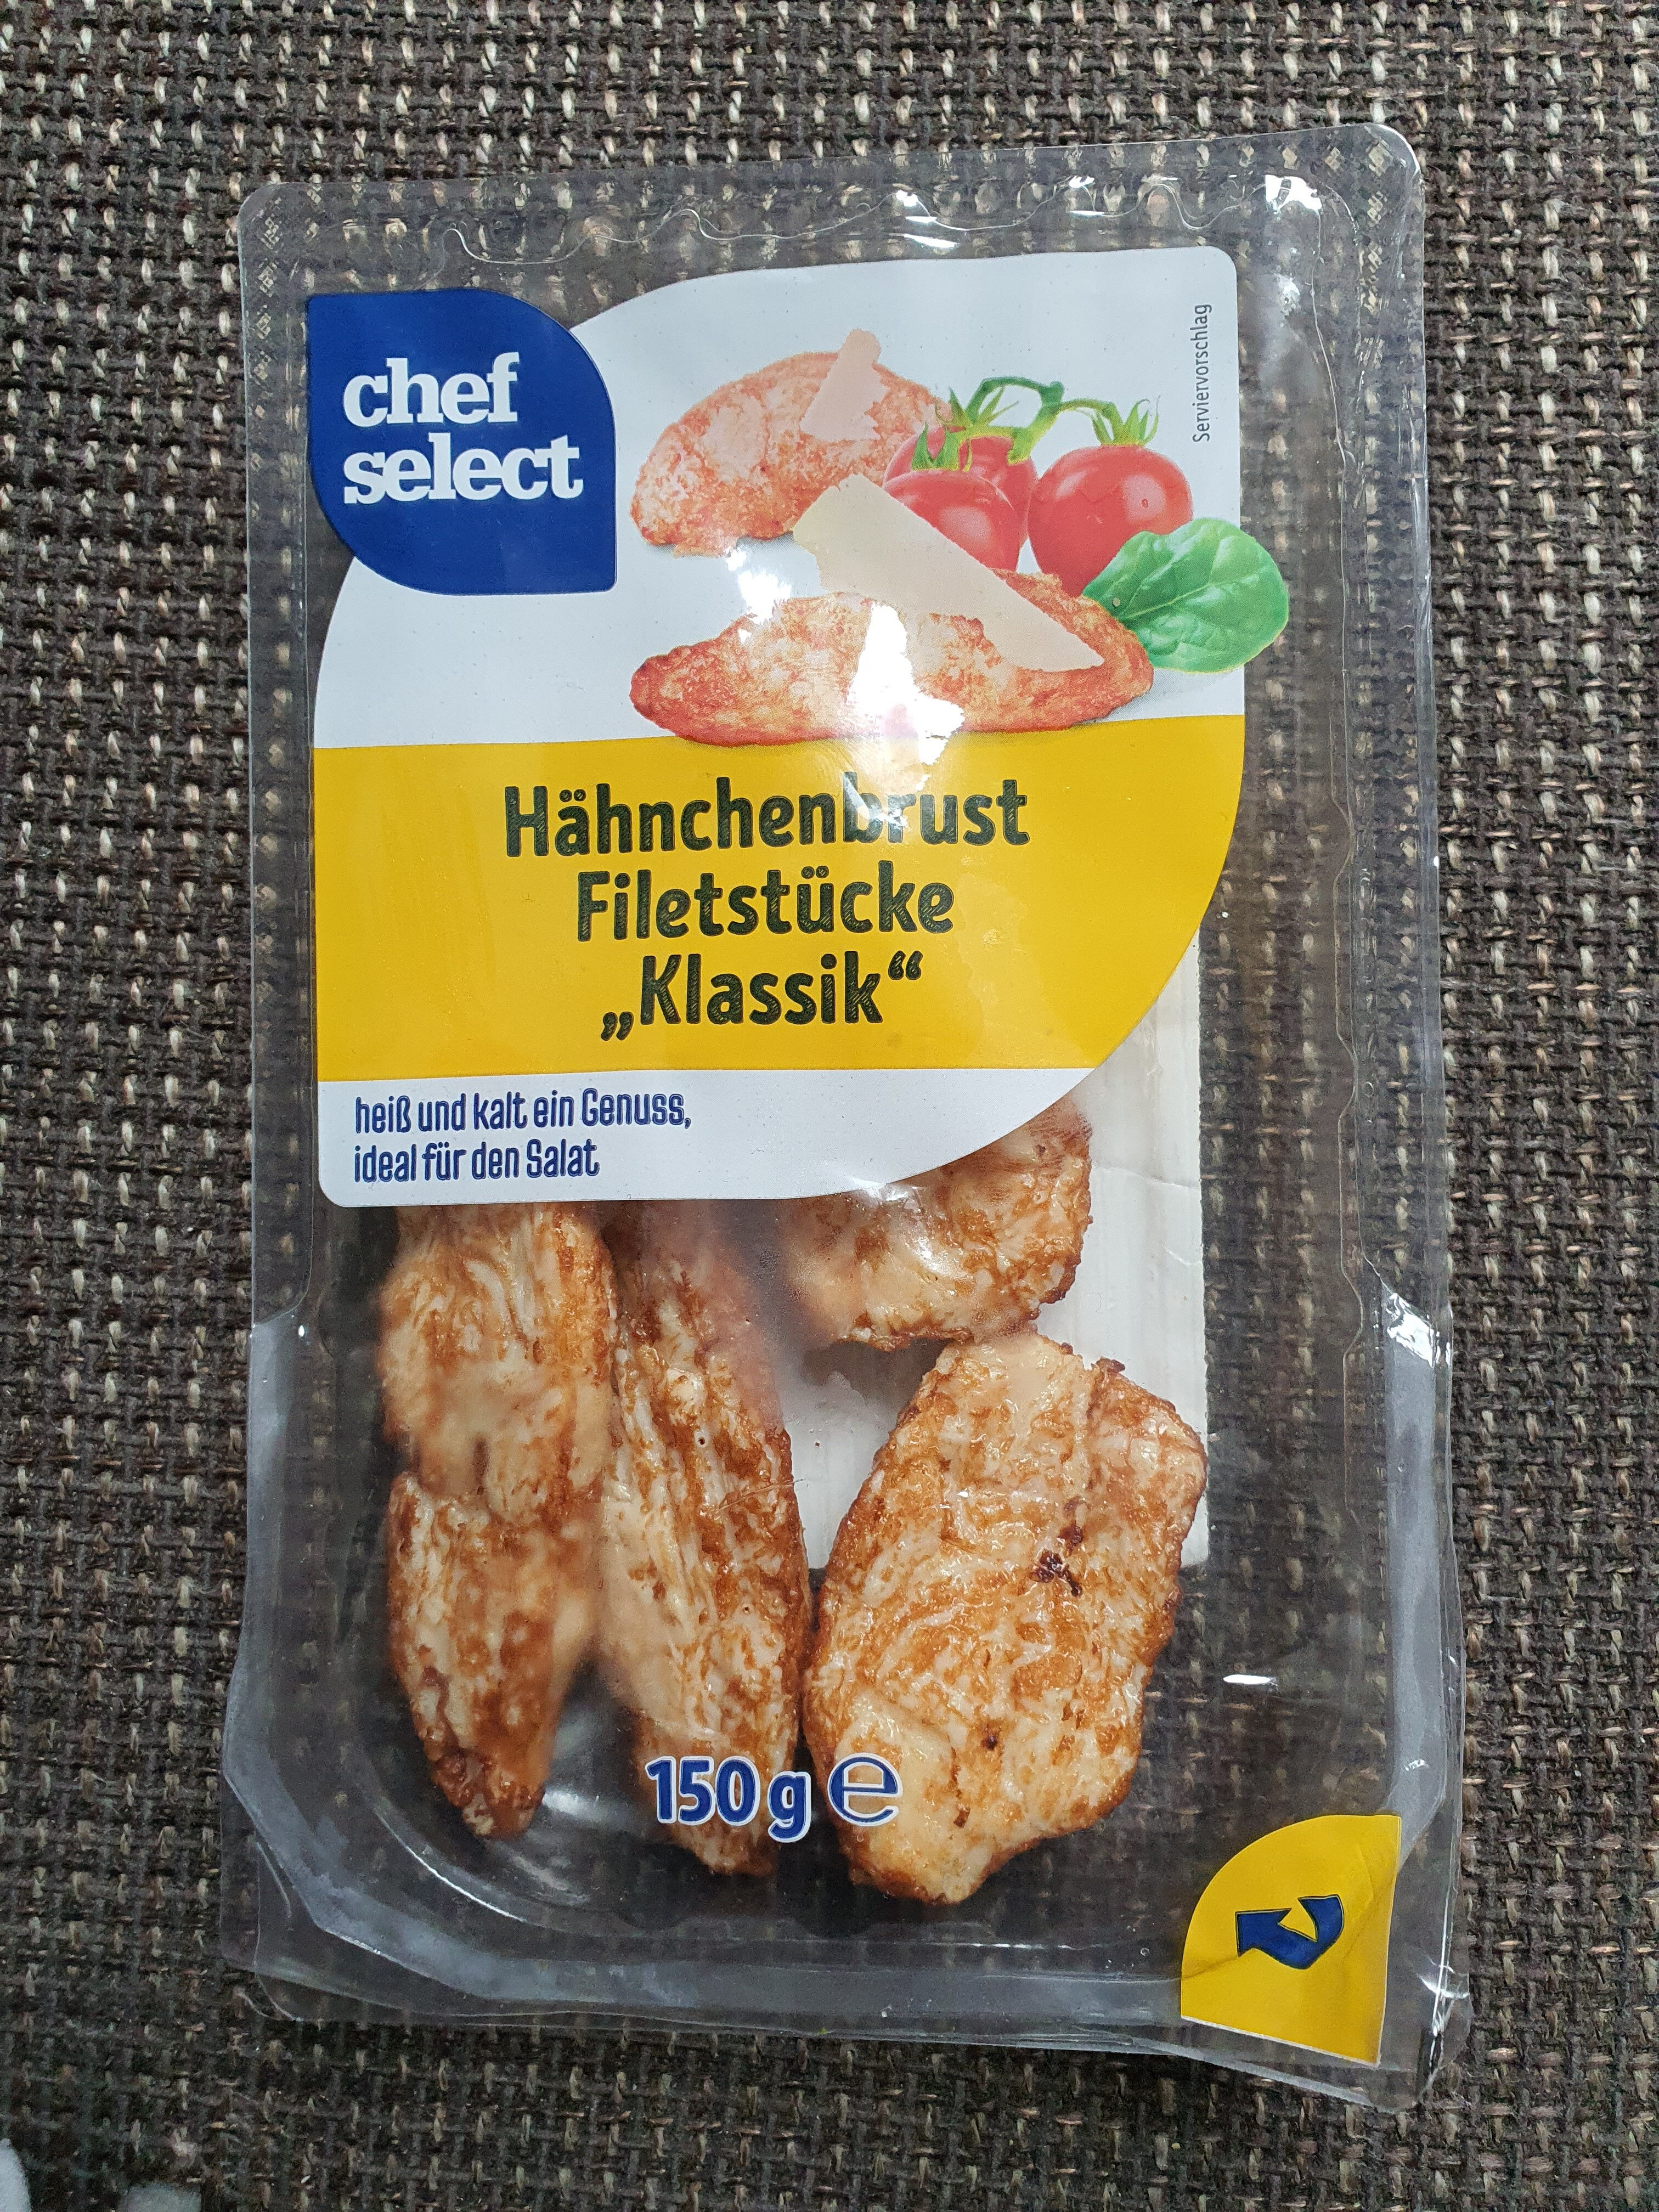 Hähnchenbrust Filetstücke Klassik - Produit - de